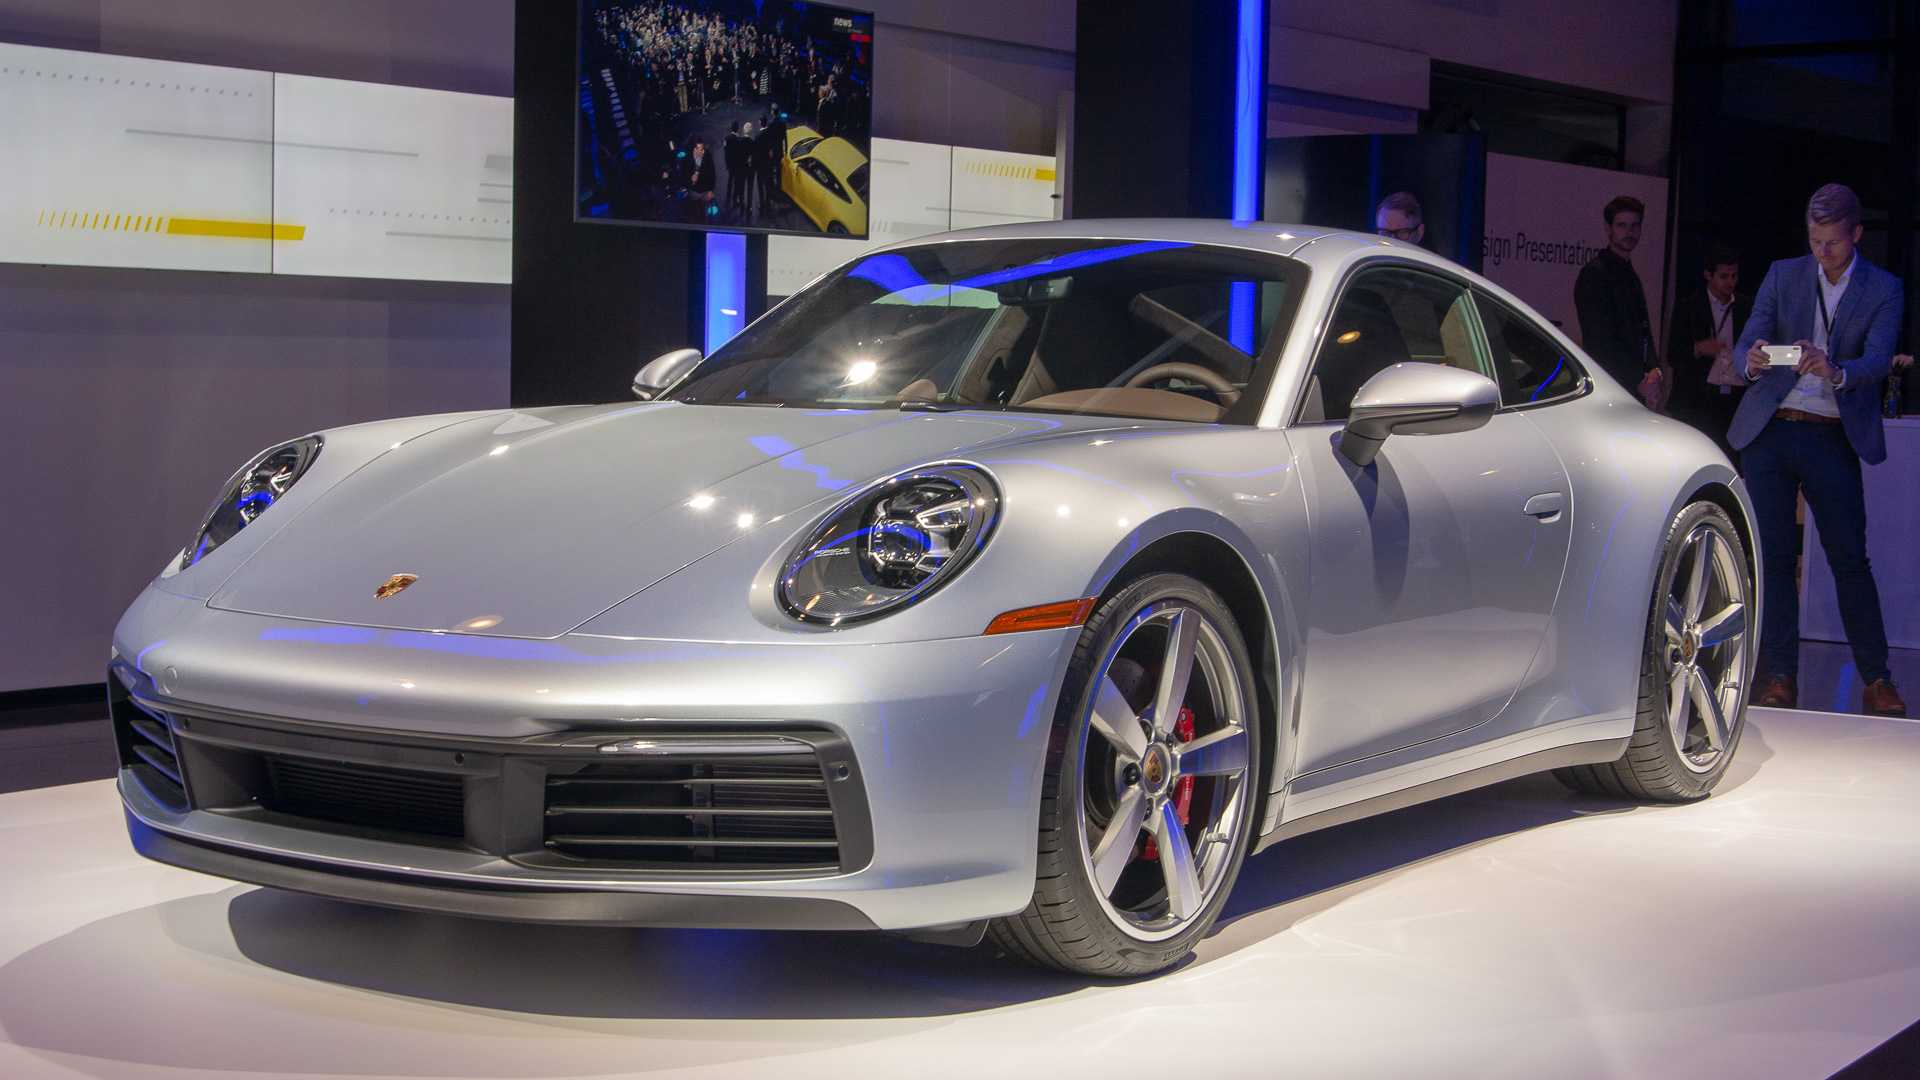 22 New 2020 Porsche 911 Release Date Redesign by 2020 Porsche 911 Release Date